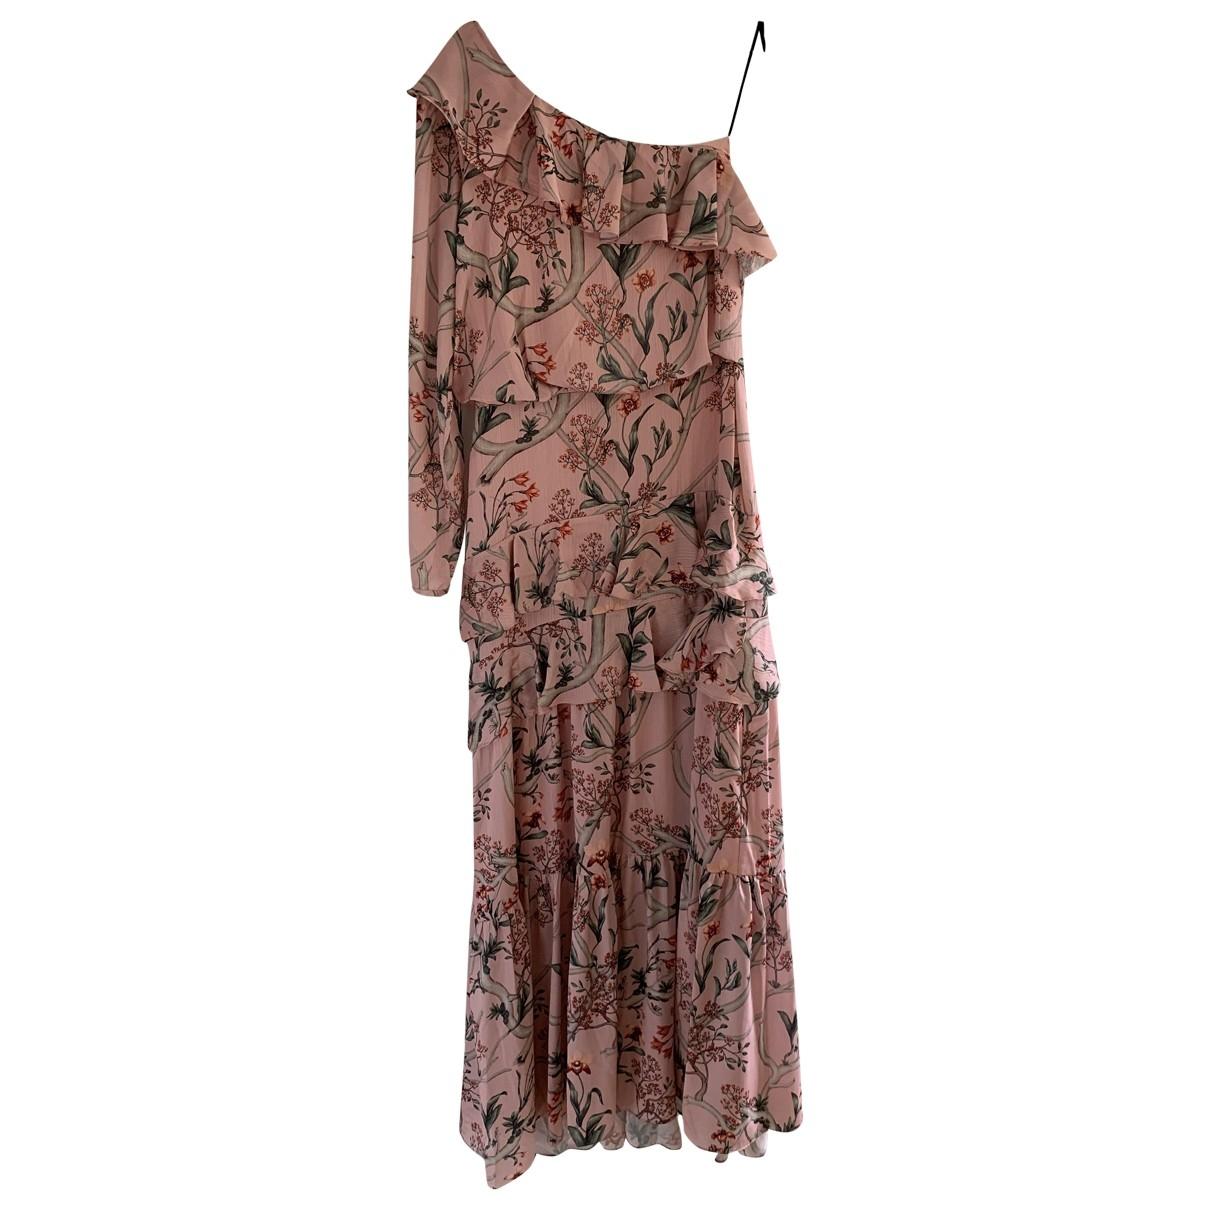 Johanna Ortiz X H&m \N Kleid in  Rosa Polyester